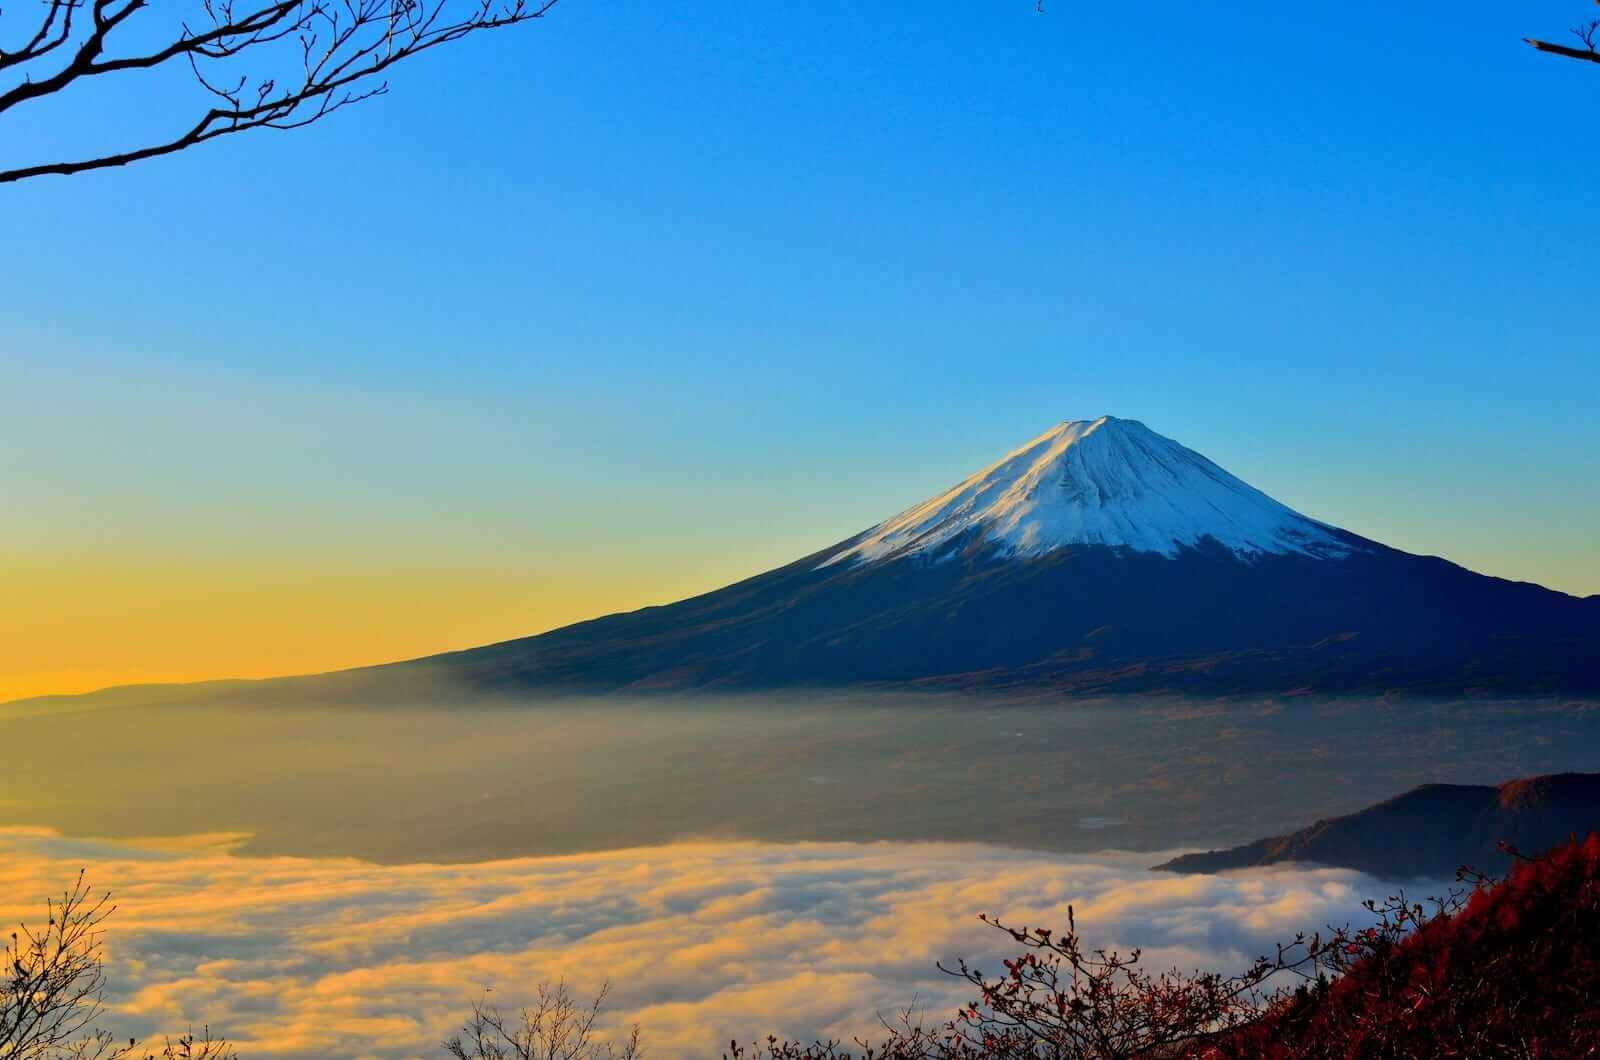 Mount Taranaki - Een indrukwekkende, slapende vulkaan